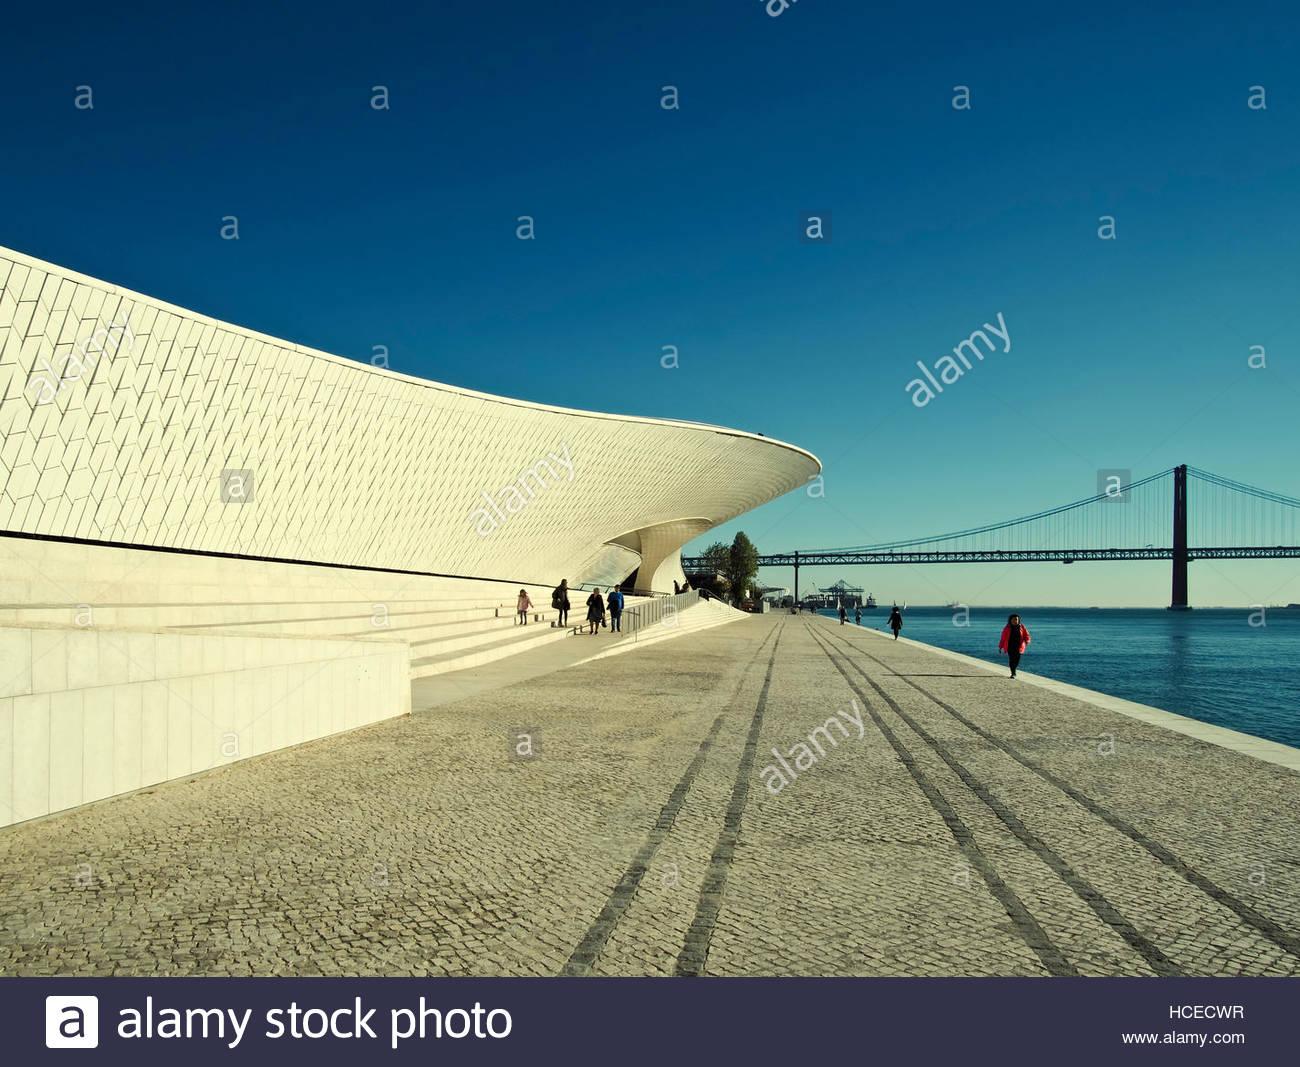 Lisbon portugal maat museum art stockfotos lisbon for Architektur lissabon